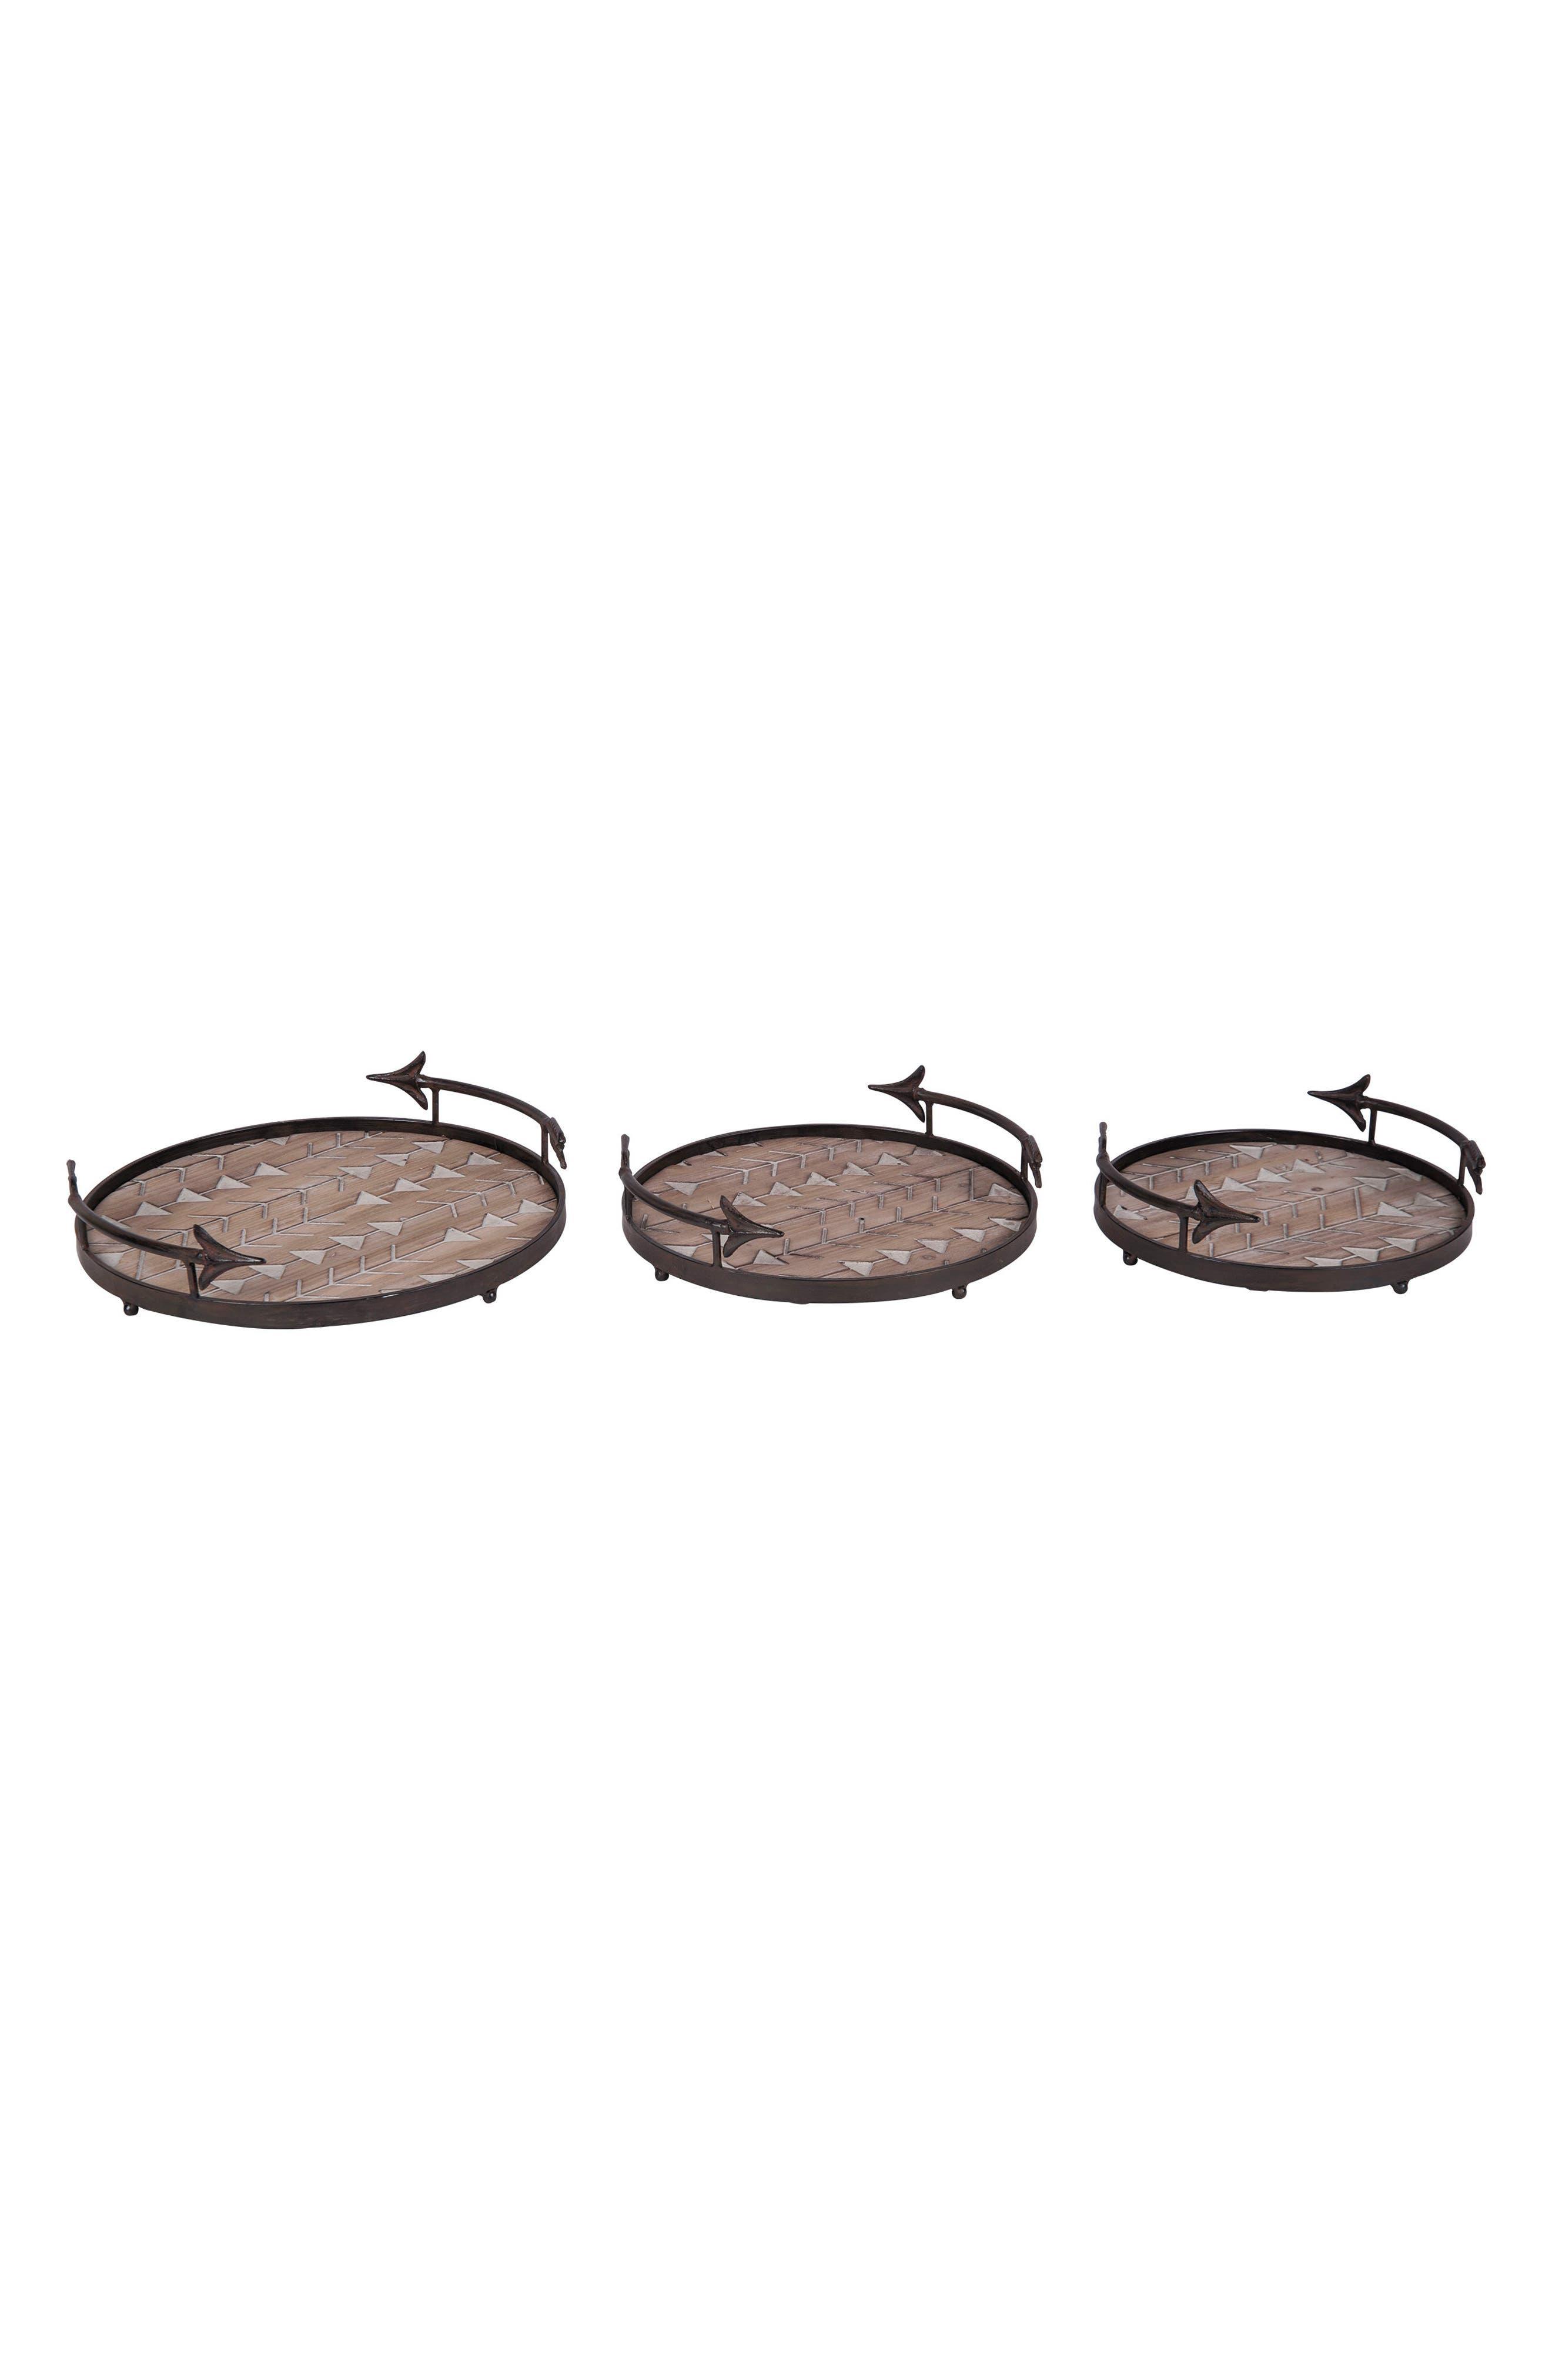 Arrow Set of 3 Nesting Trays,                             Main thumbnail 1, color,                             200